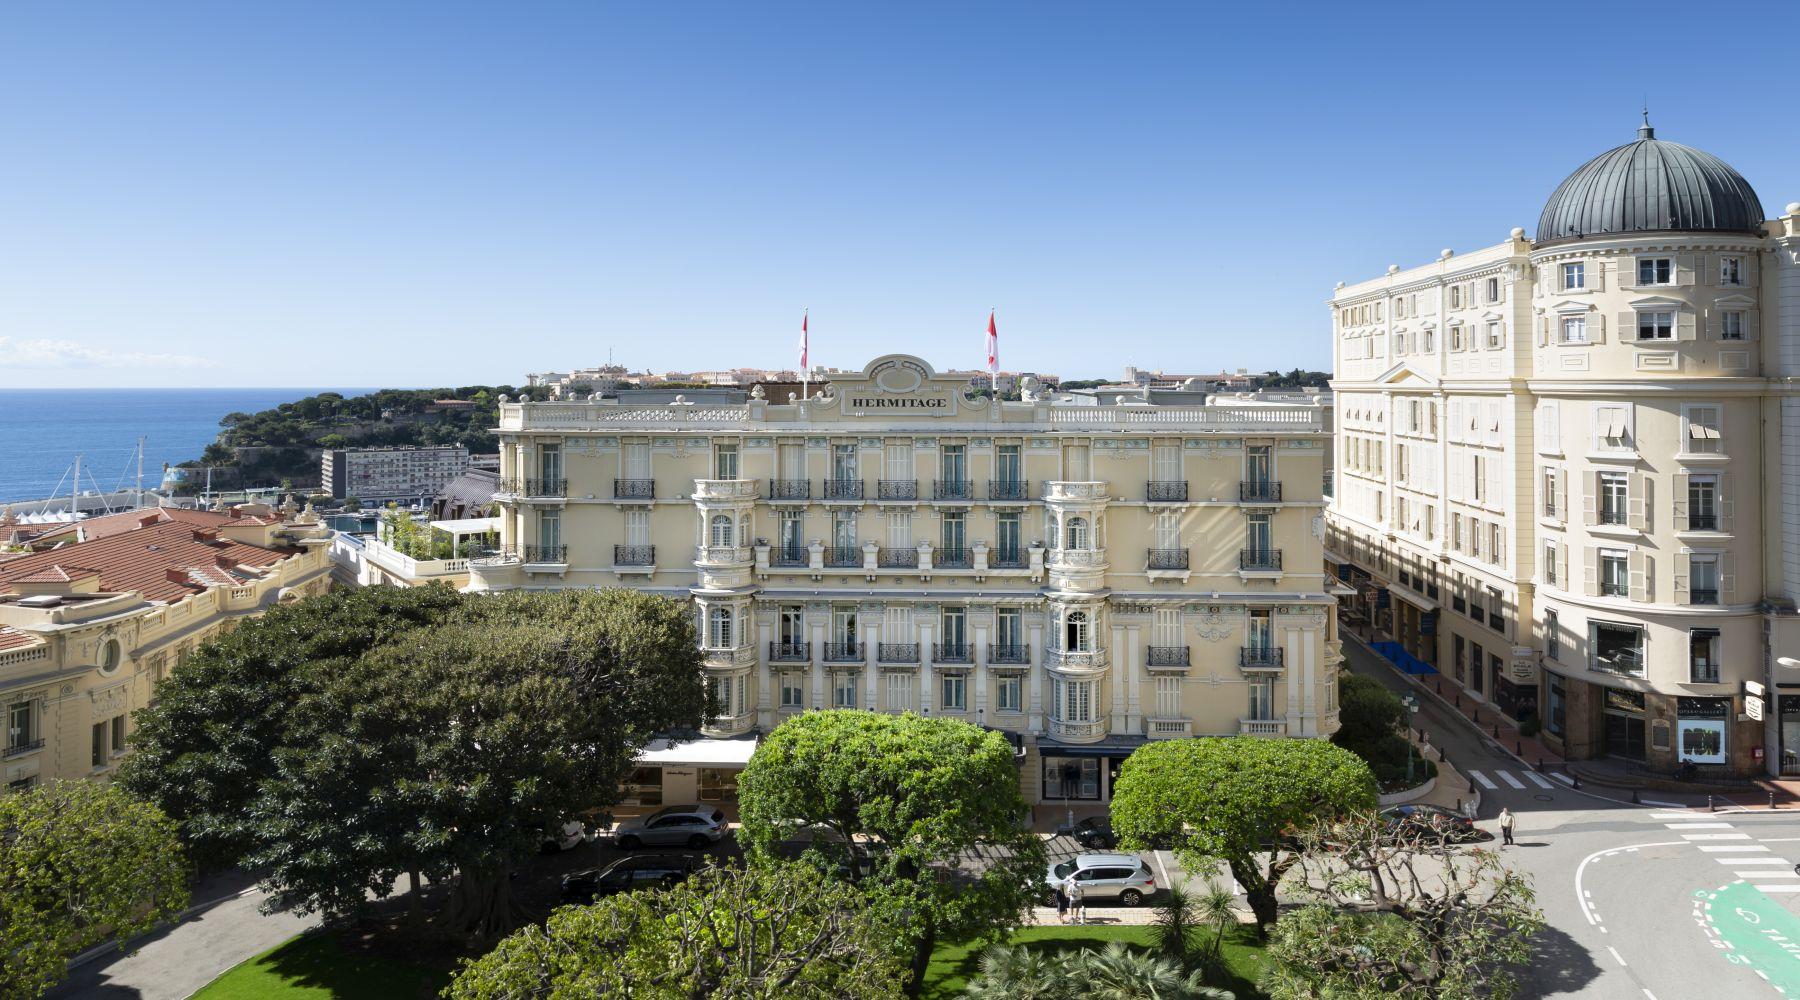 Hotel Hermitage, Monte Carlo, Monako